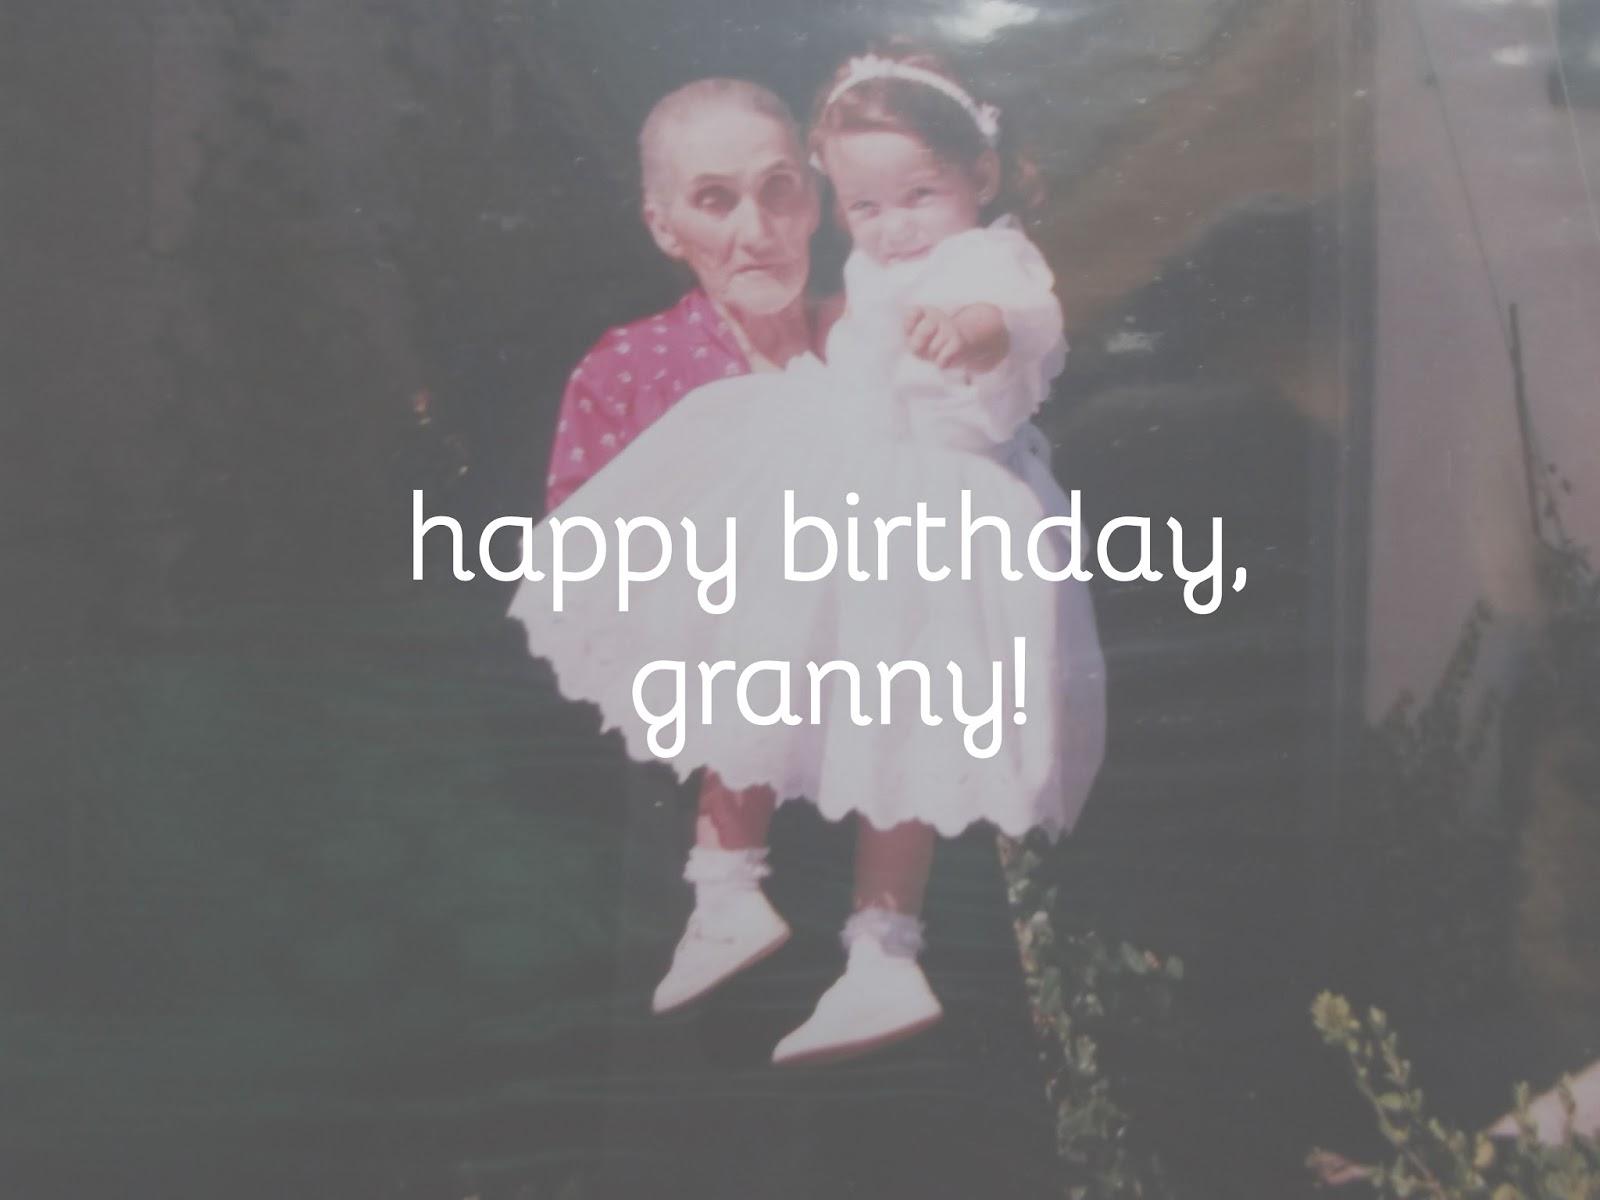 Happy 99th birthday to my granny!